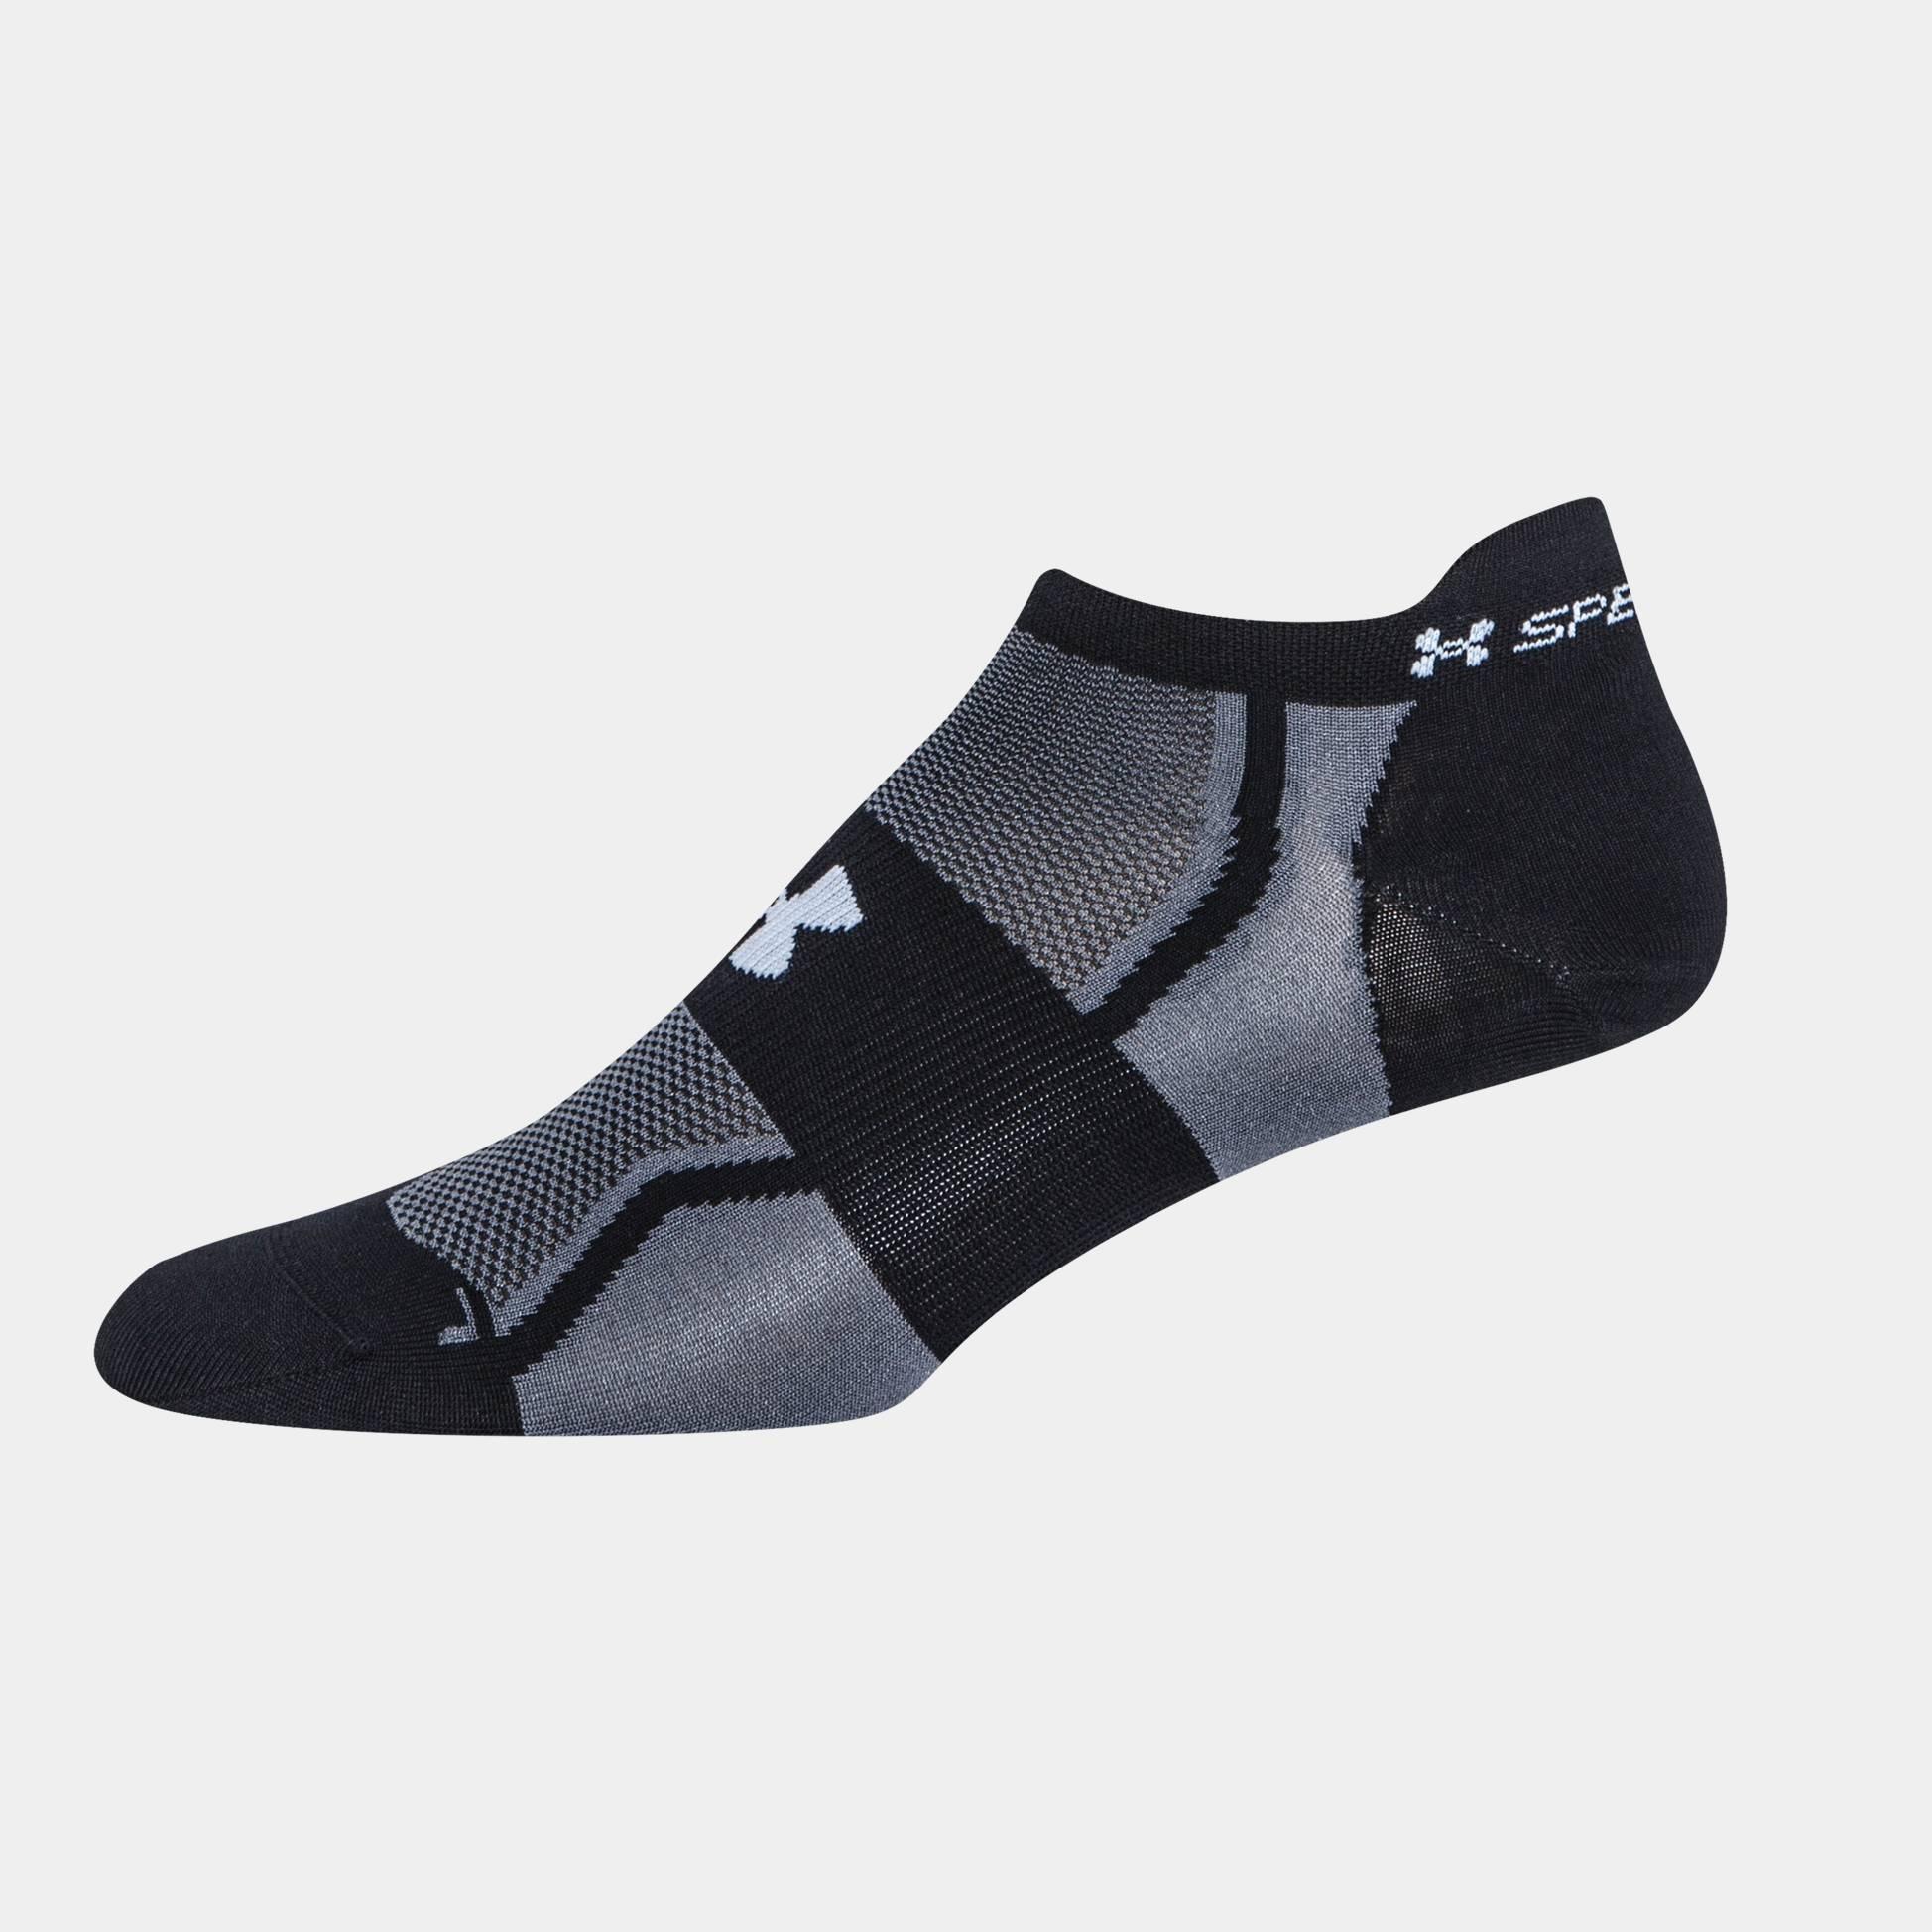 Fitness Under Armour Speedform No Show Socks